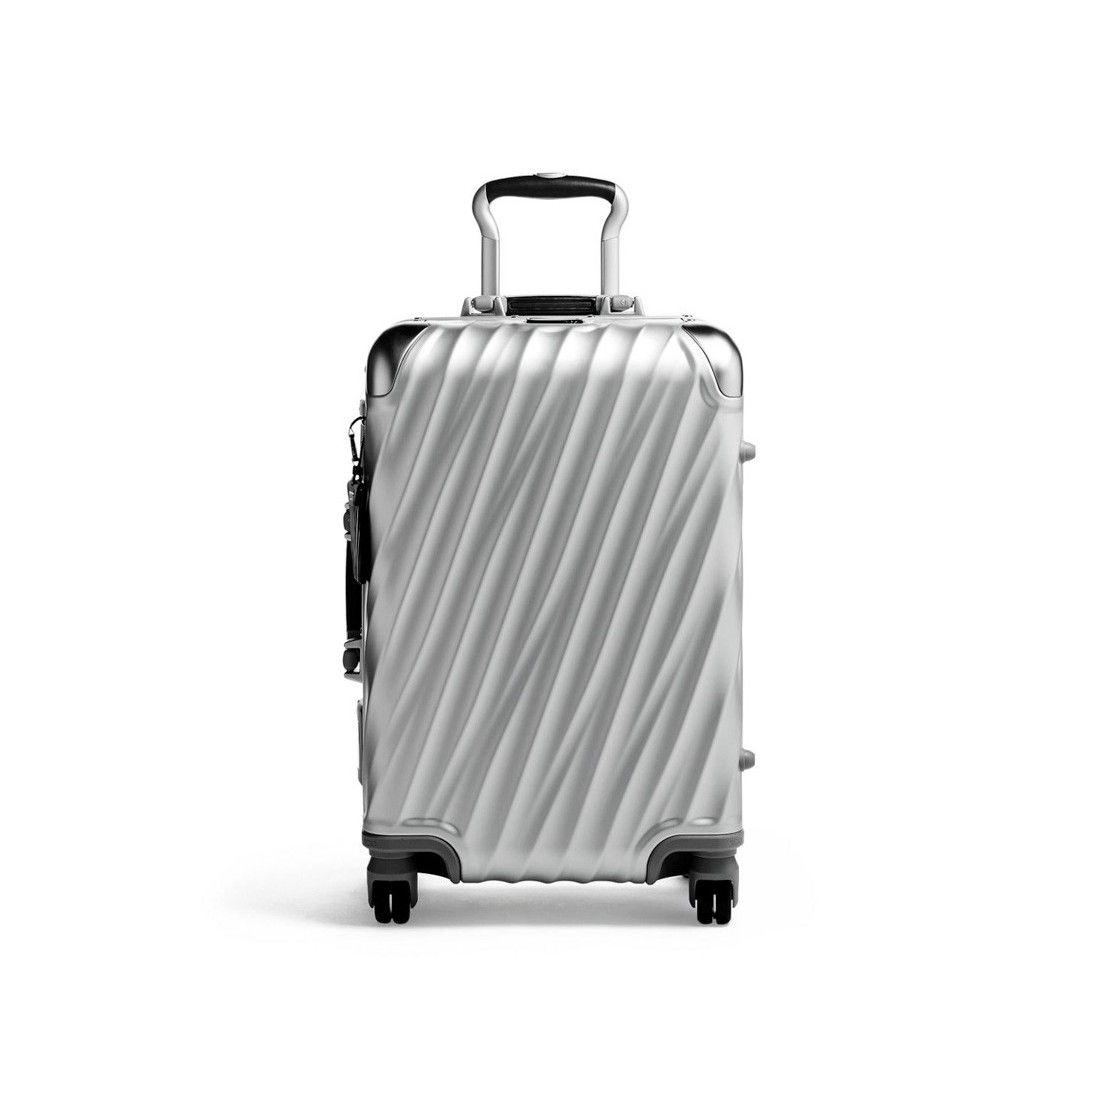 Tumi 19 Degree maleta gris maleta rígida maleta spinner